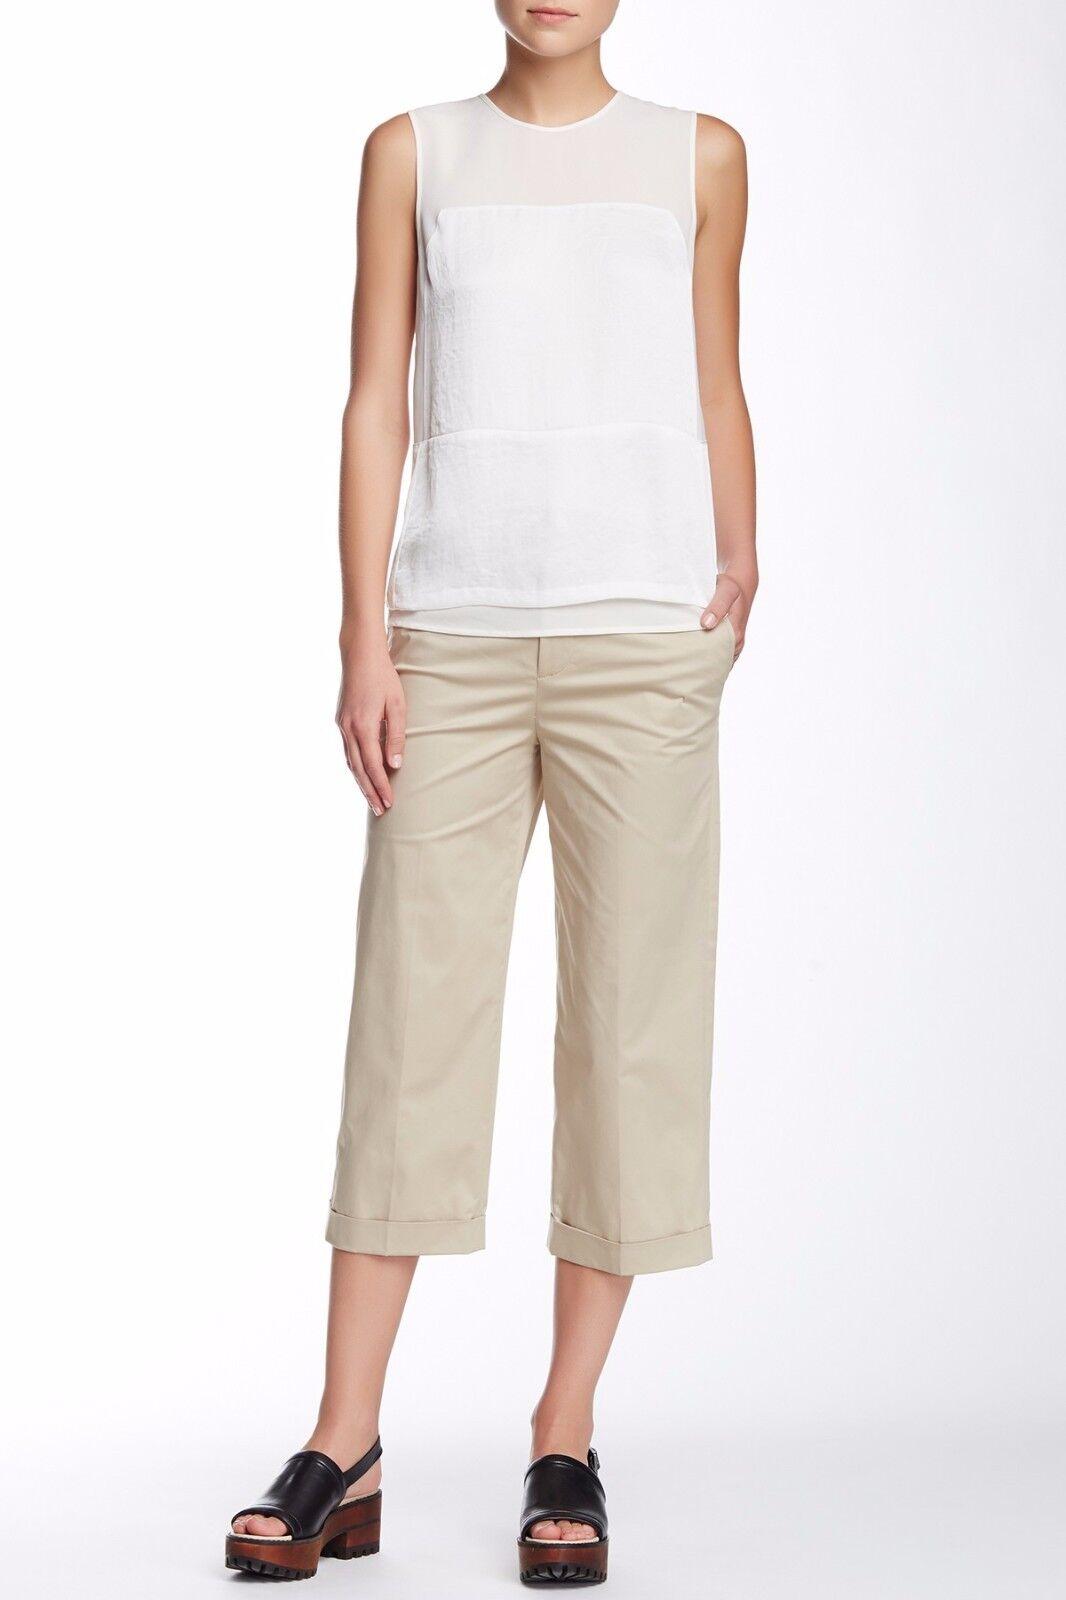 NWT J Brand Stanhope Trouser Pants Khaki  295 – Size 6